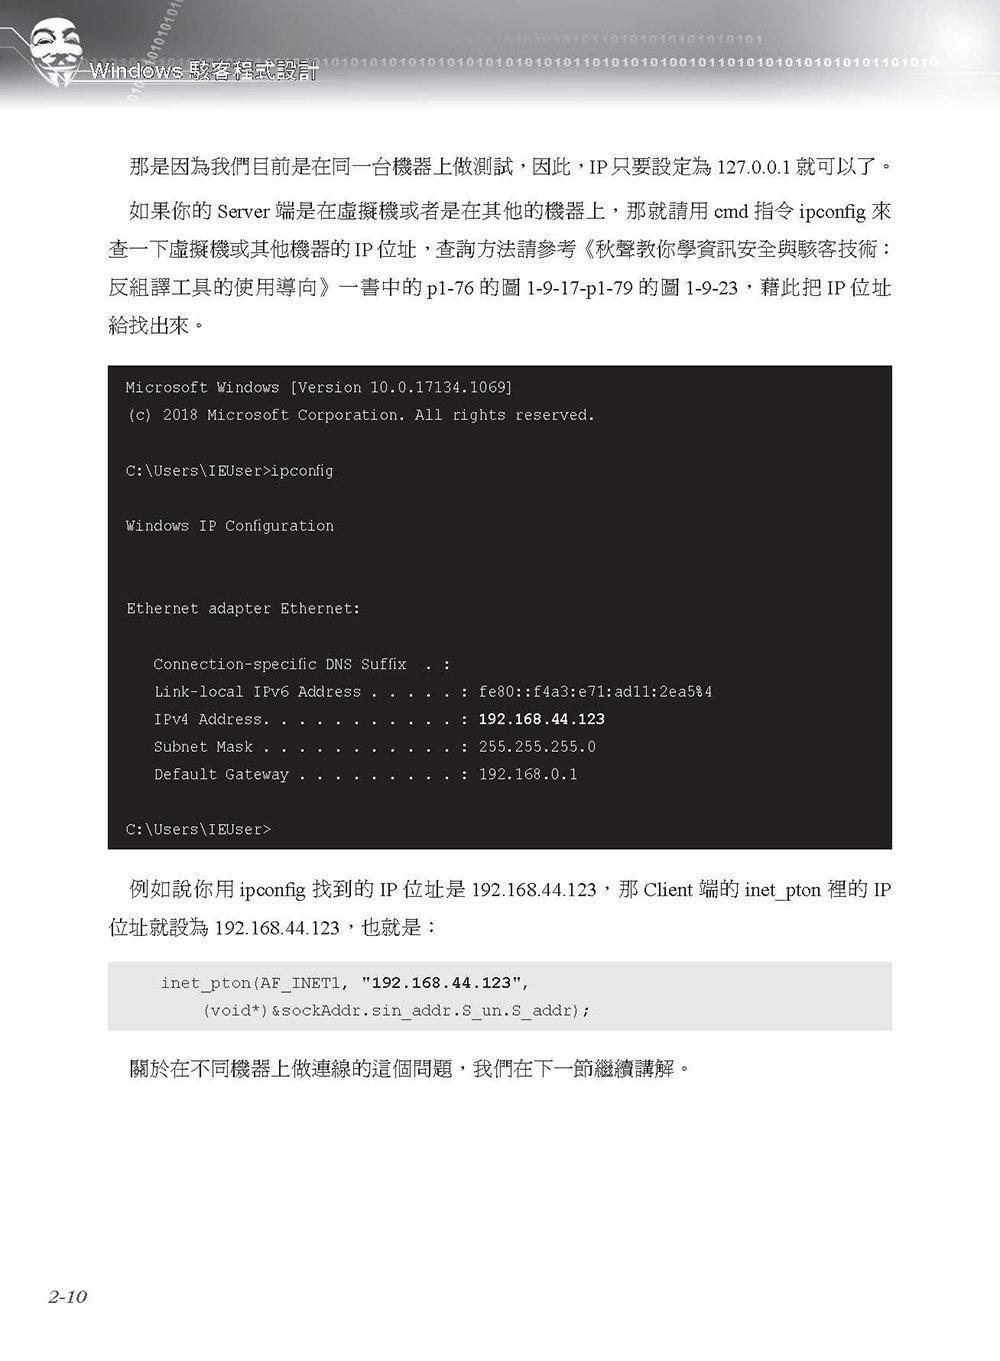 Windows 駭客程式設計:駭客攻防及惡意程式研發 (基礎修行篇)-preview-14